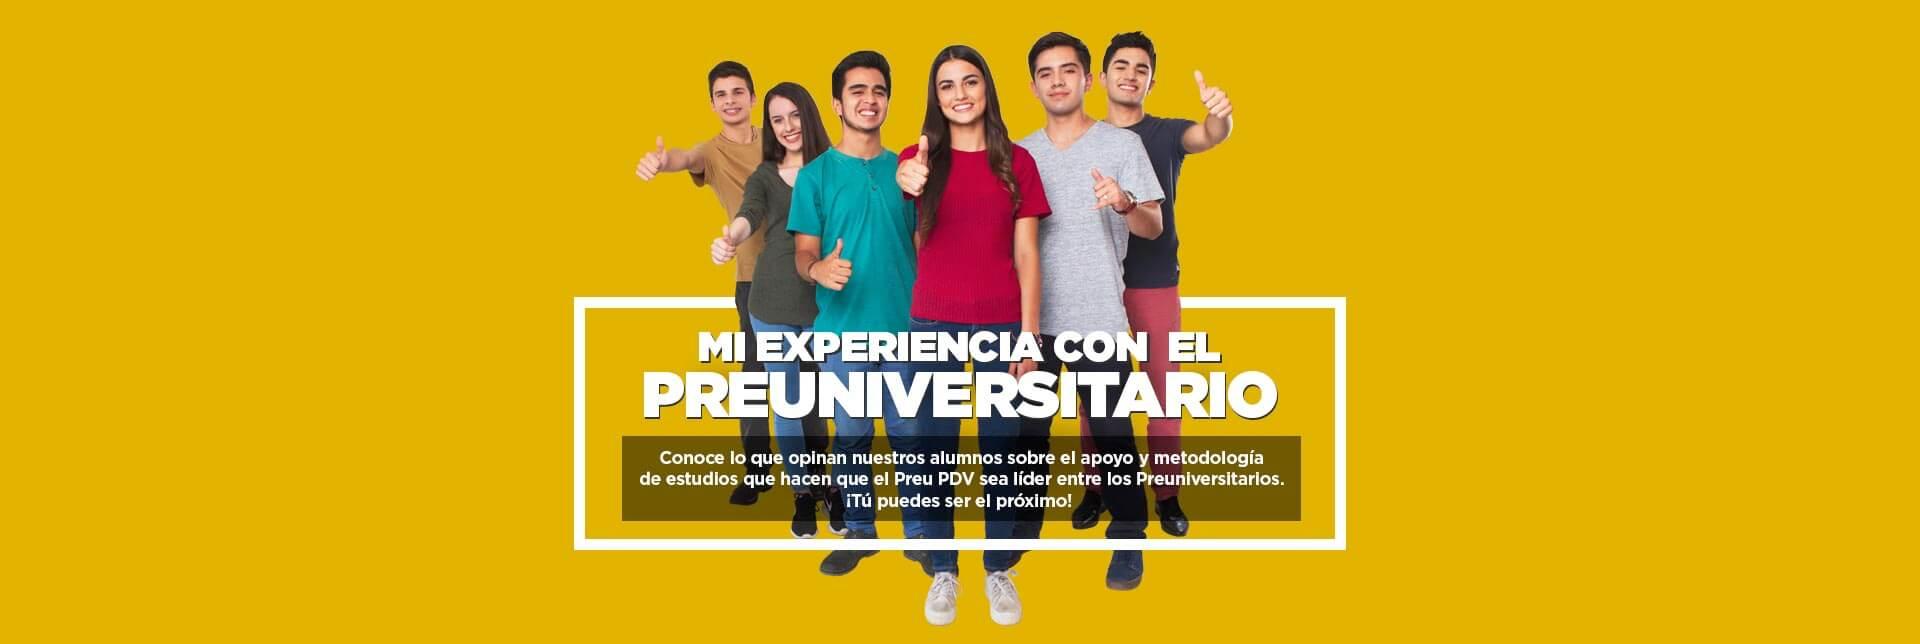 Experiencia Preuniversitarios Pruebas de Seleccion PDV